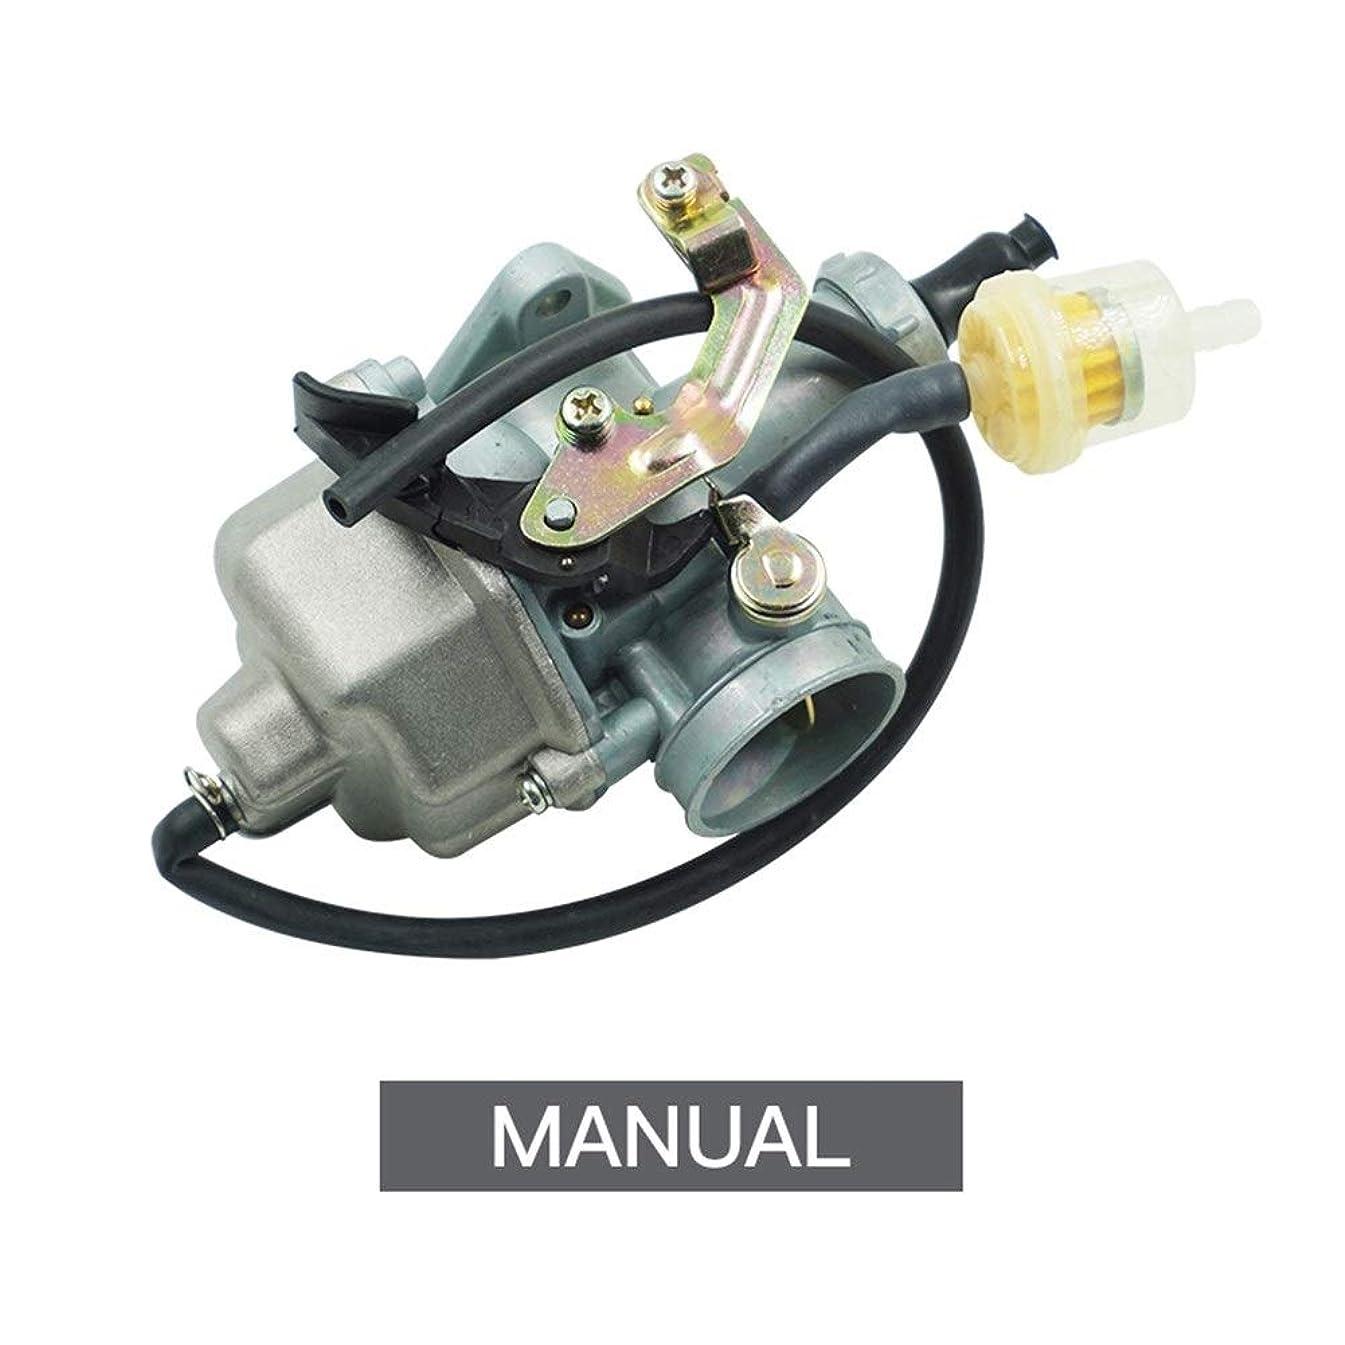 Easy to Install Motorcycle Keihin PZ26 Carburetor Carburador Used for CG125 Pit Dirt Bike ATV Quad 4 Wheeler Engine Moto Model Useful ( Color : PZ26-Manual )